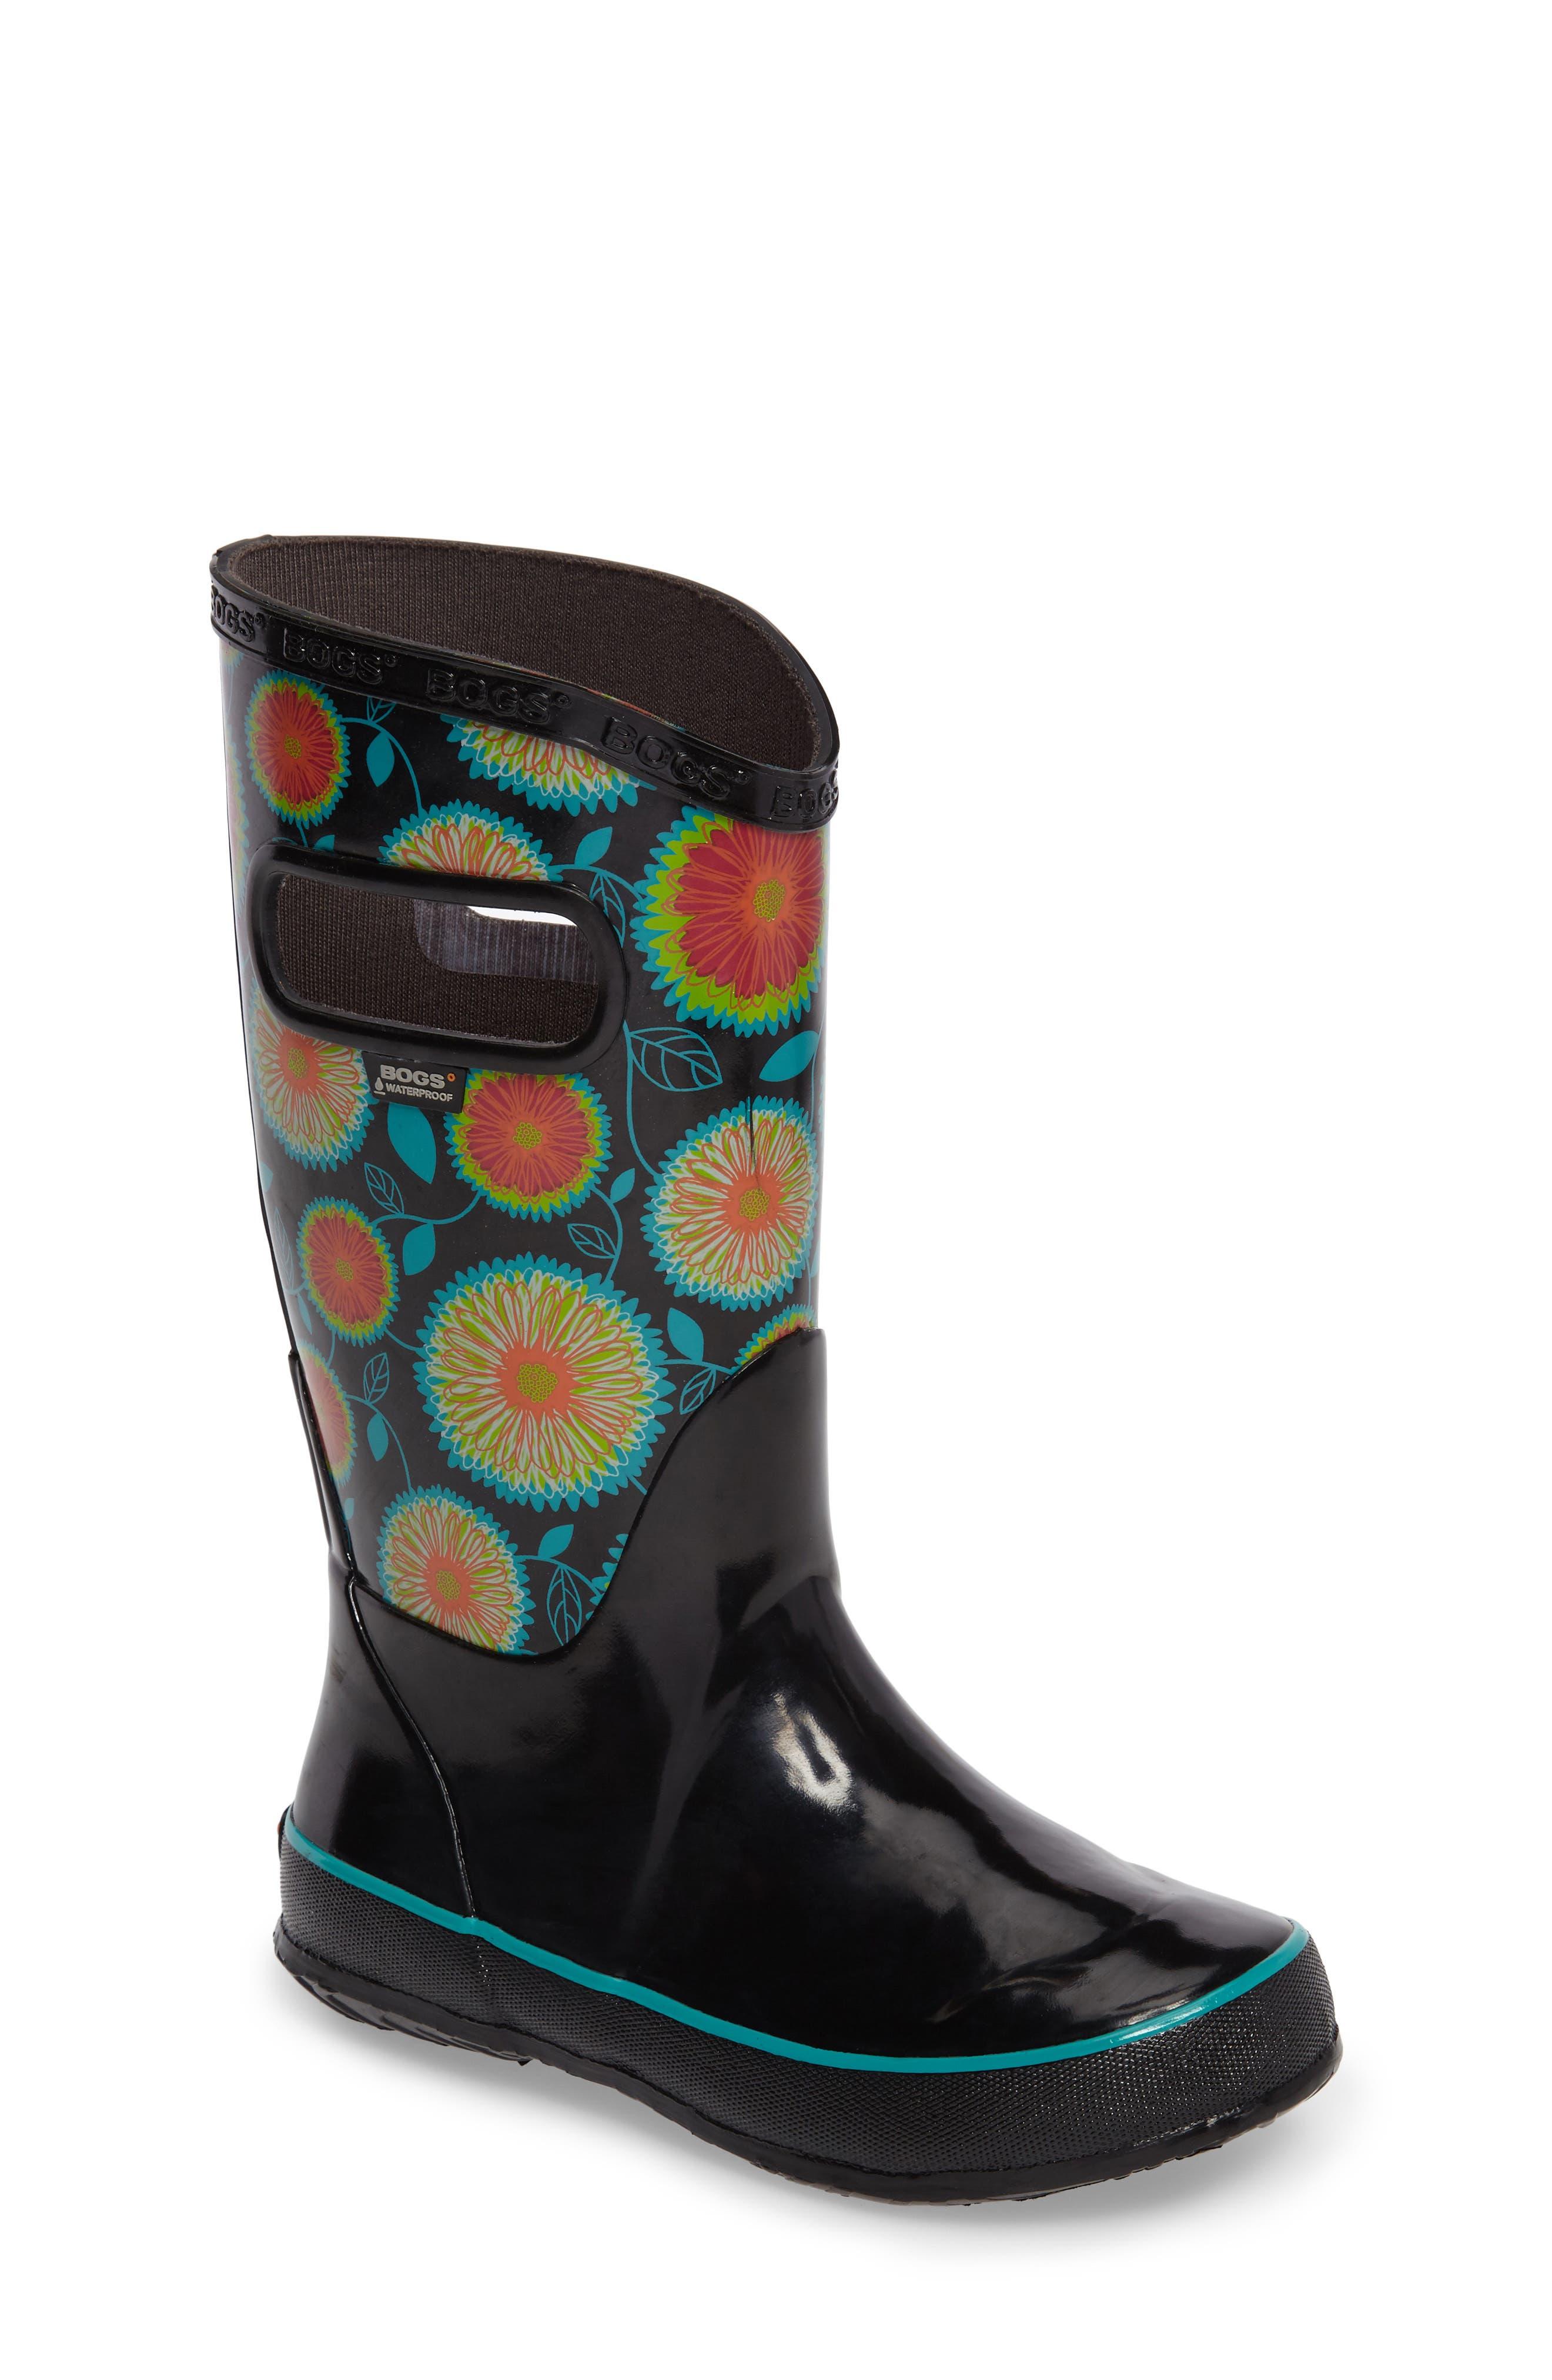 Wildflowers Waterproof Rubber Rain Boot,                         Main,                         color, 009